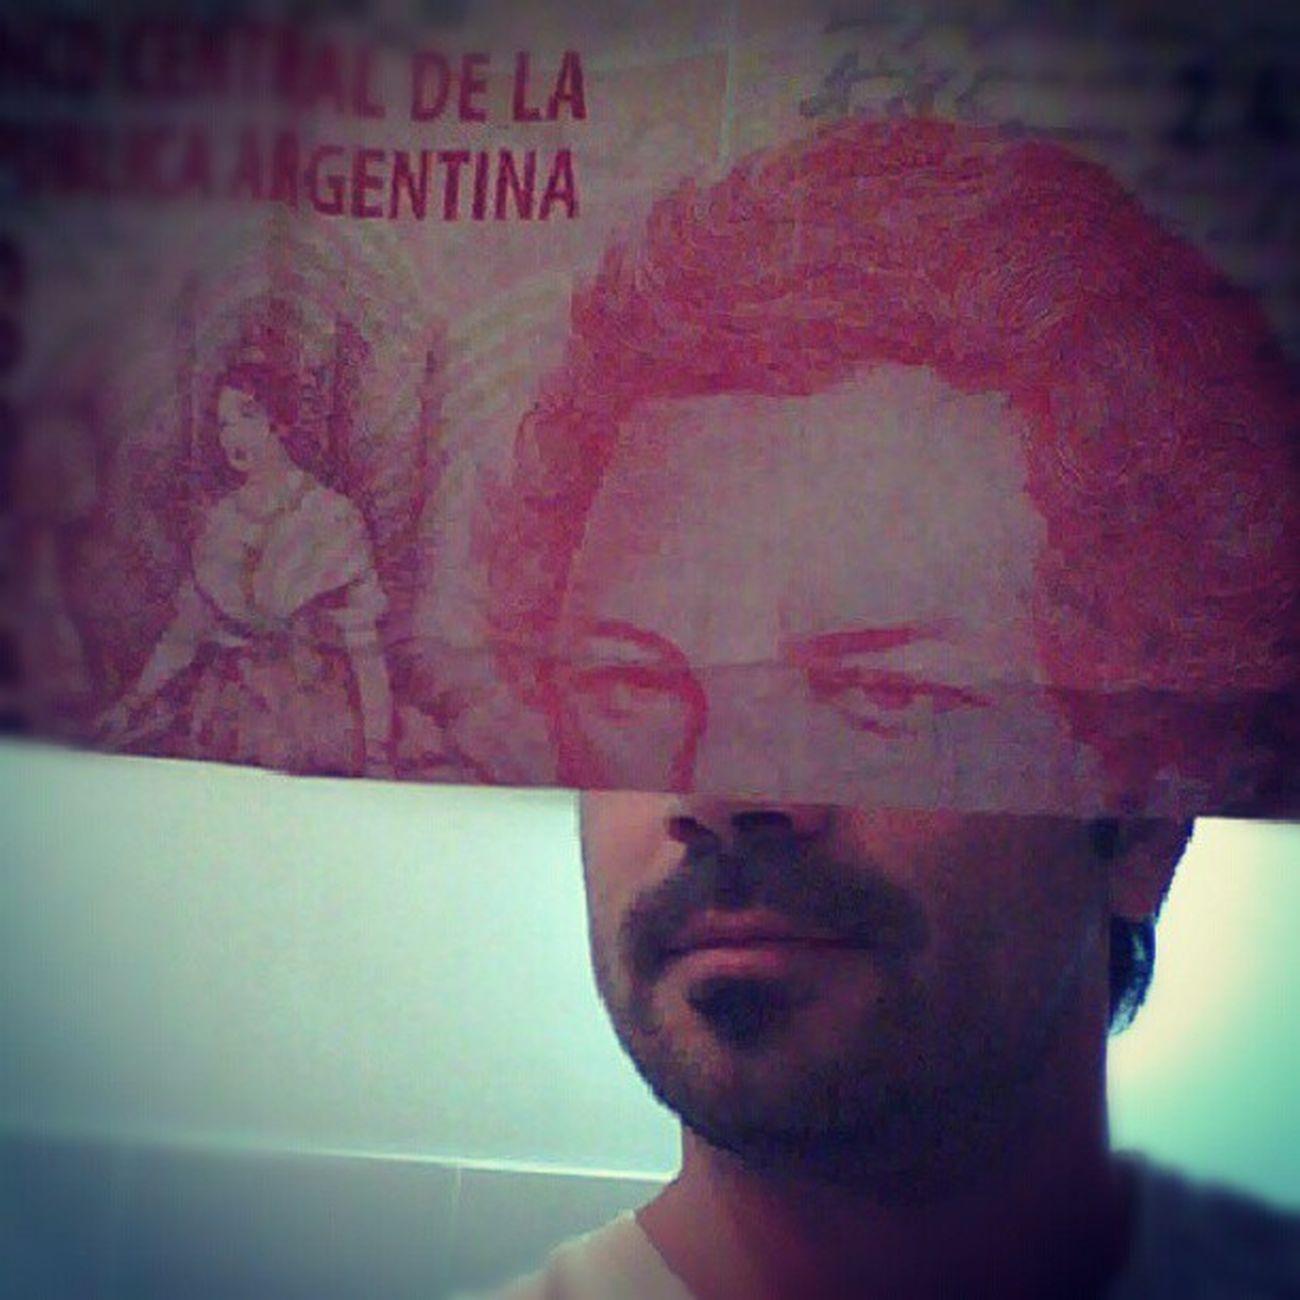 Moneyface Argentina Pesos 20pesos Dinero Plata